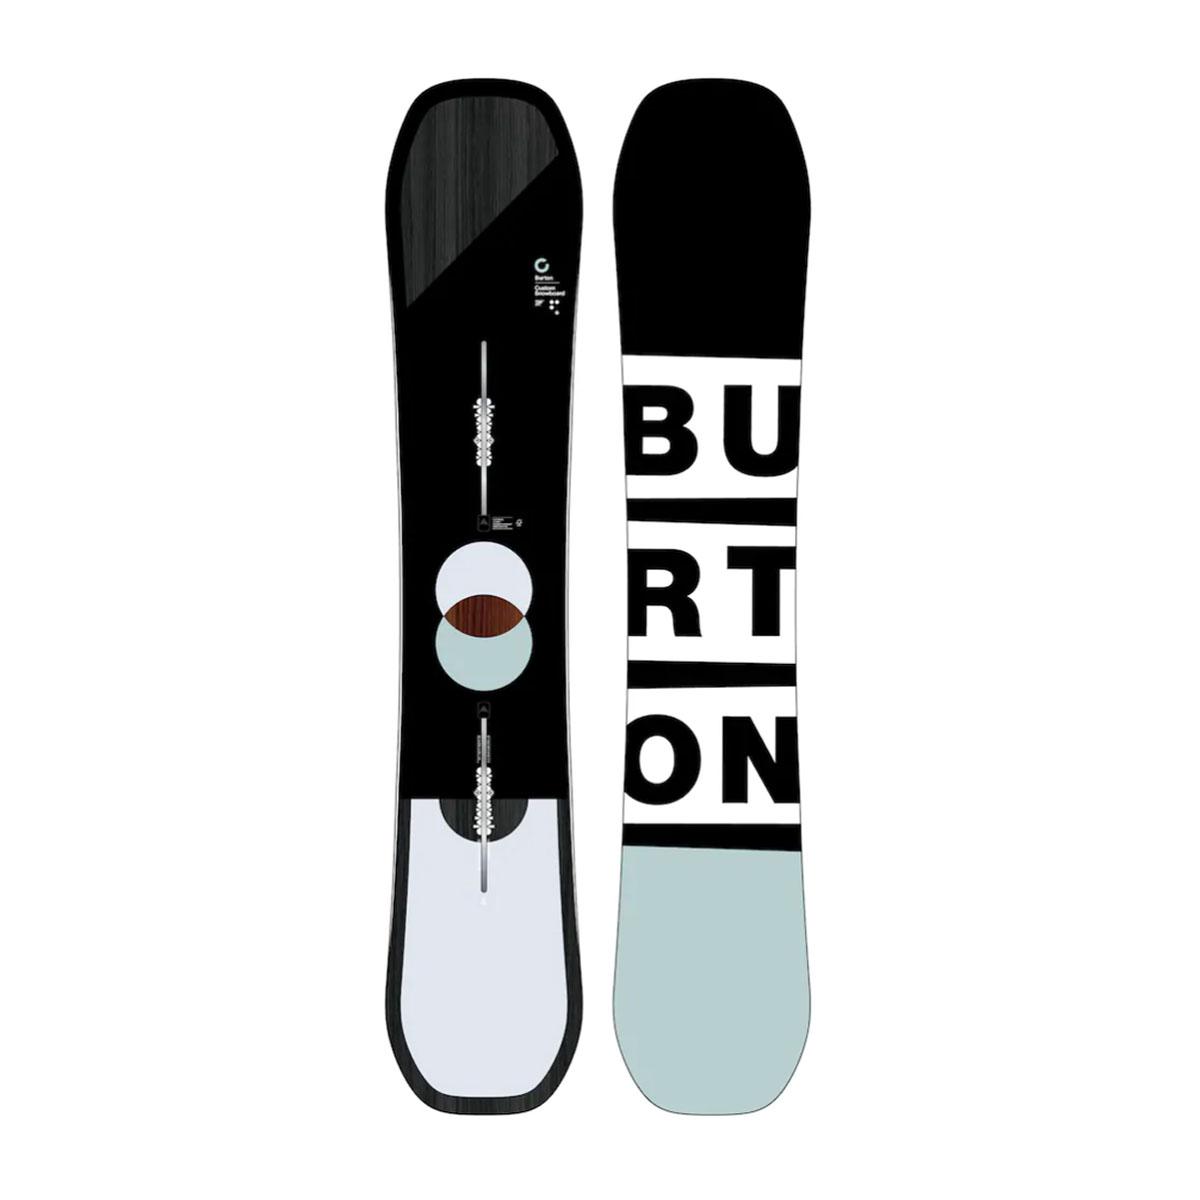 Burton CUSTOM FLYING V 166W 19/20